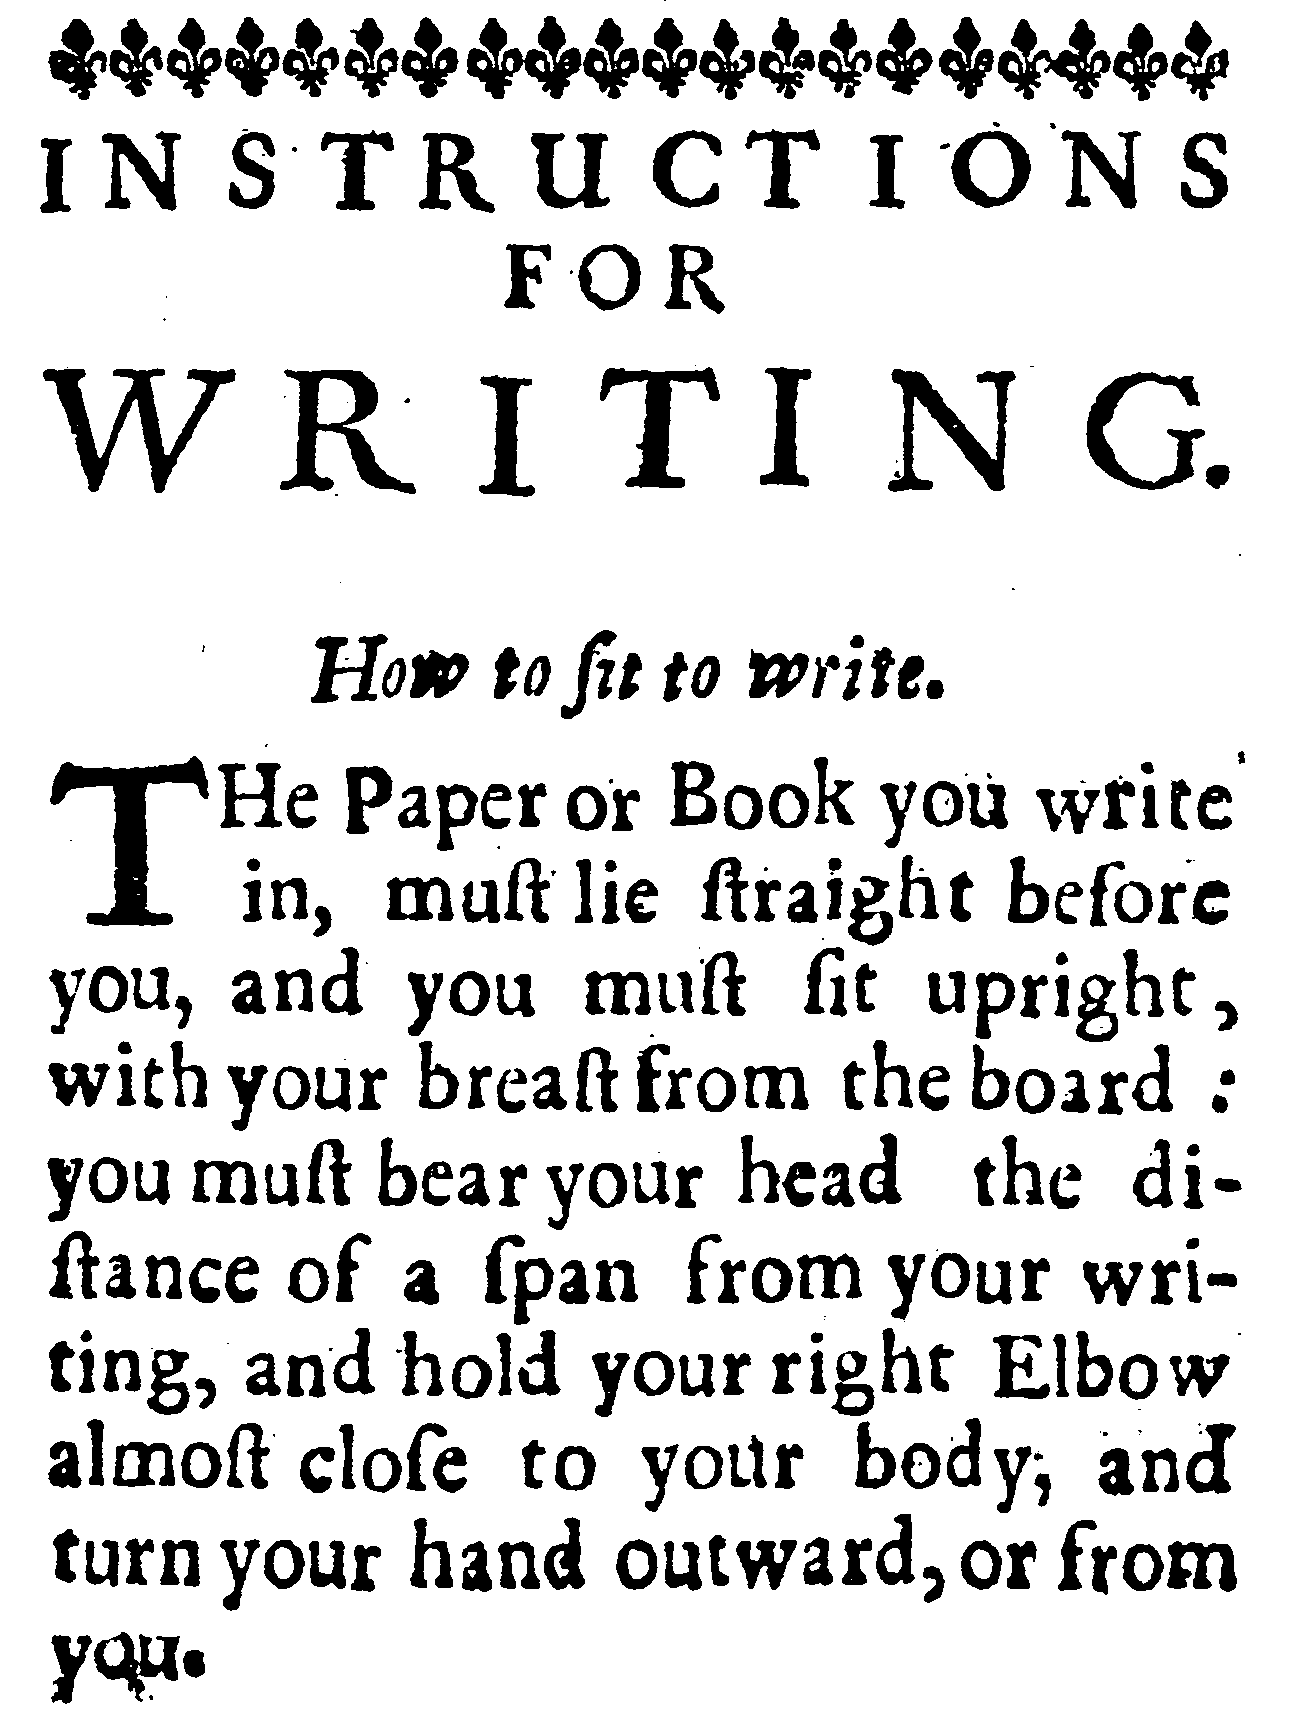 how to write good legal stuff